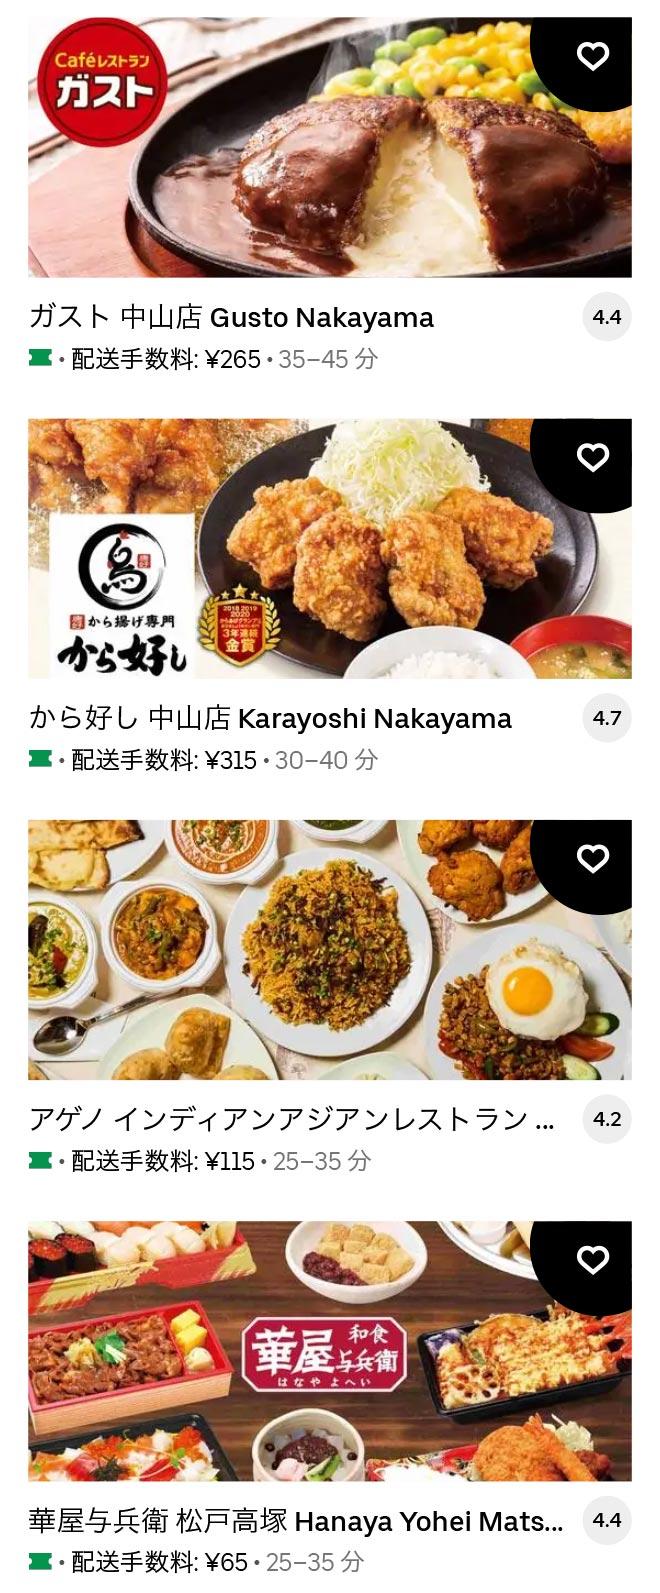 U ichikawa oono 2105 06